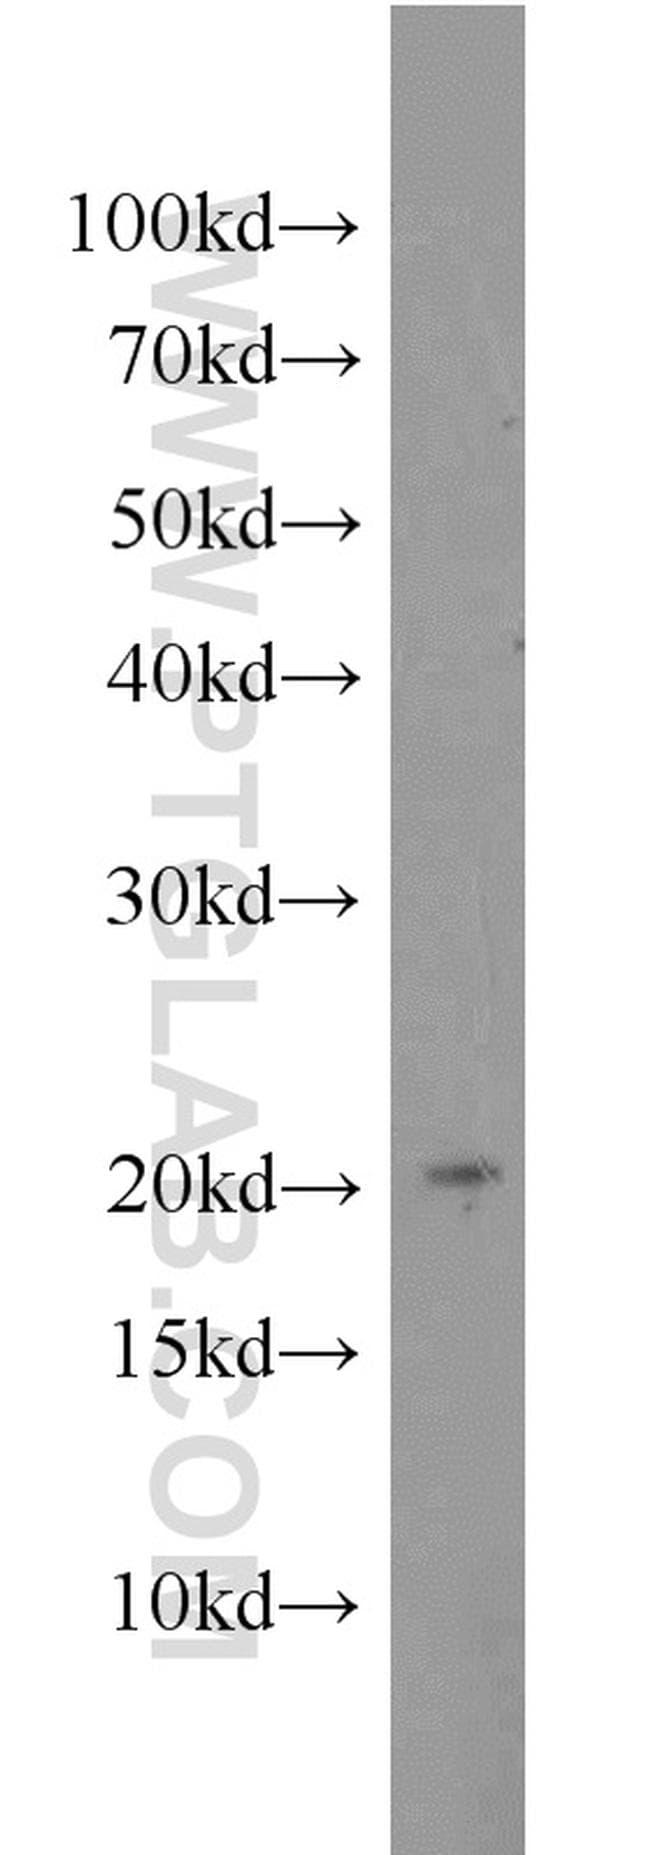 MIXL1 Antibody in Western Blot (WB)